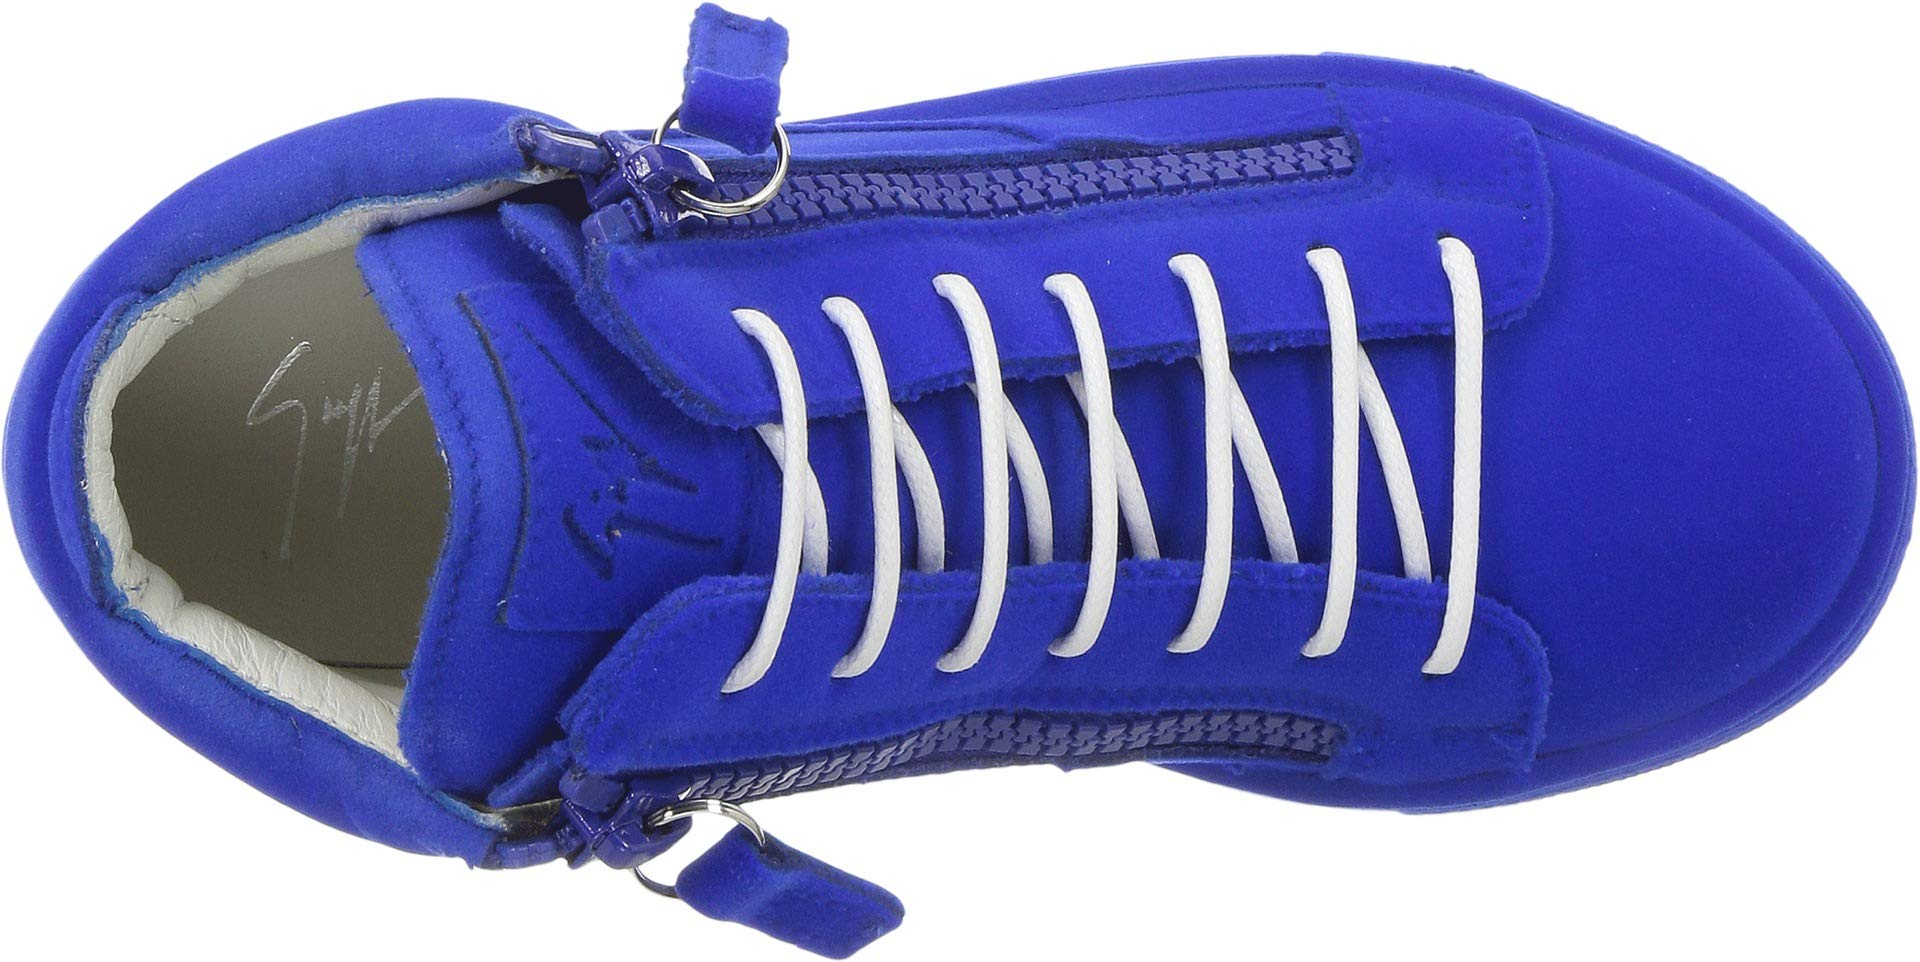 Giuseppe Zanotti Kids Unisex Flock Sneaker (Toddler/Little Kid) Electric Blue 30 M EU M by Giuseppe Zanotti Kids (Image #2)